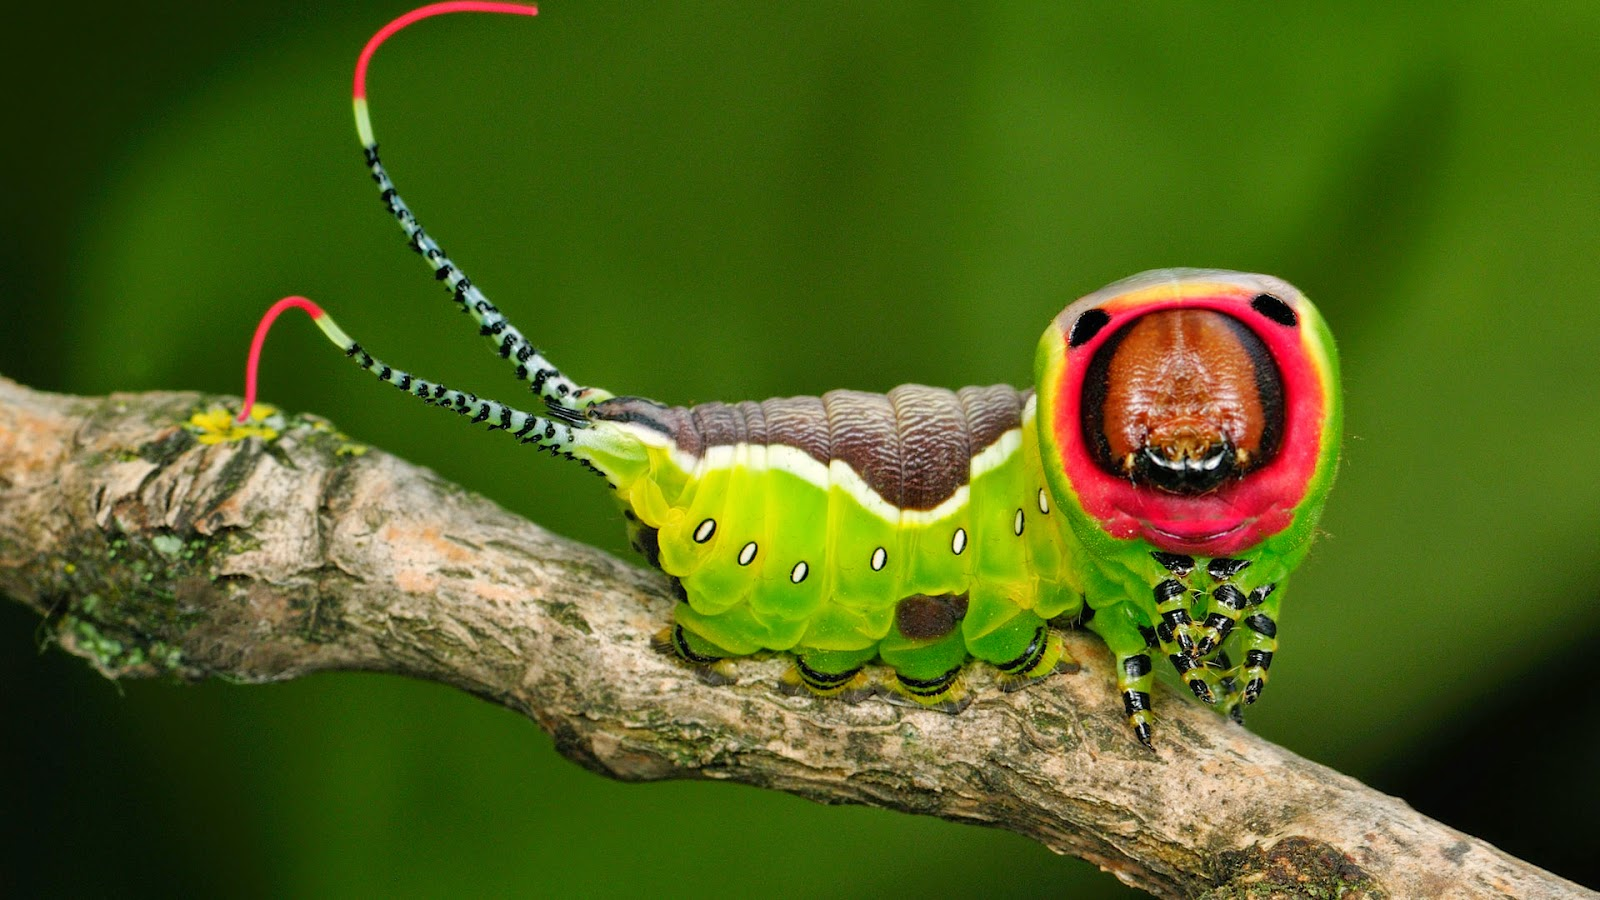 Beetle Boys Bioblog Top 5 Strangest Caterpillars